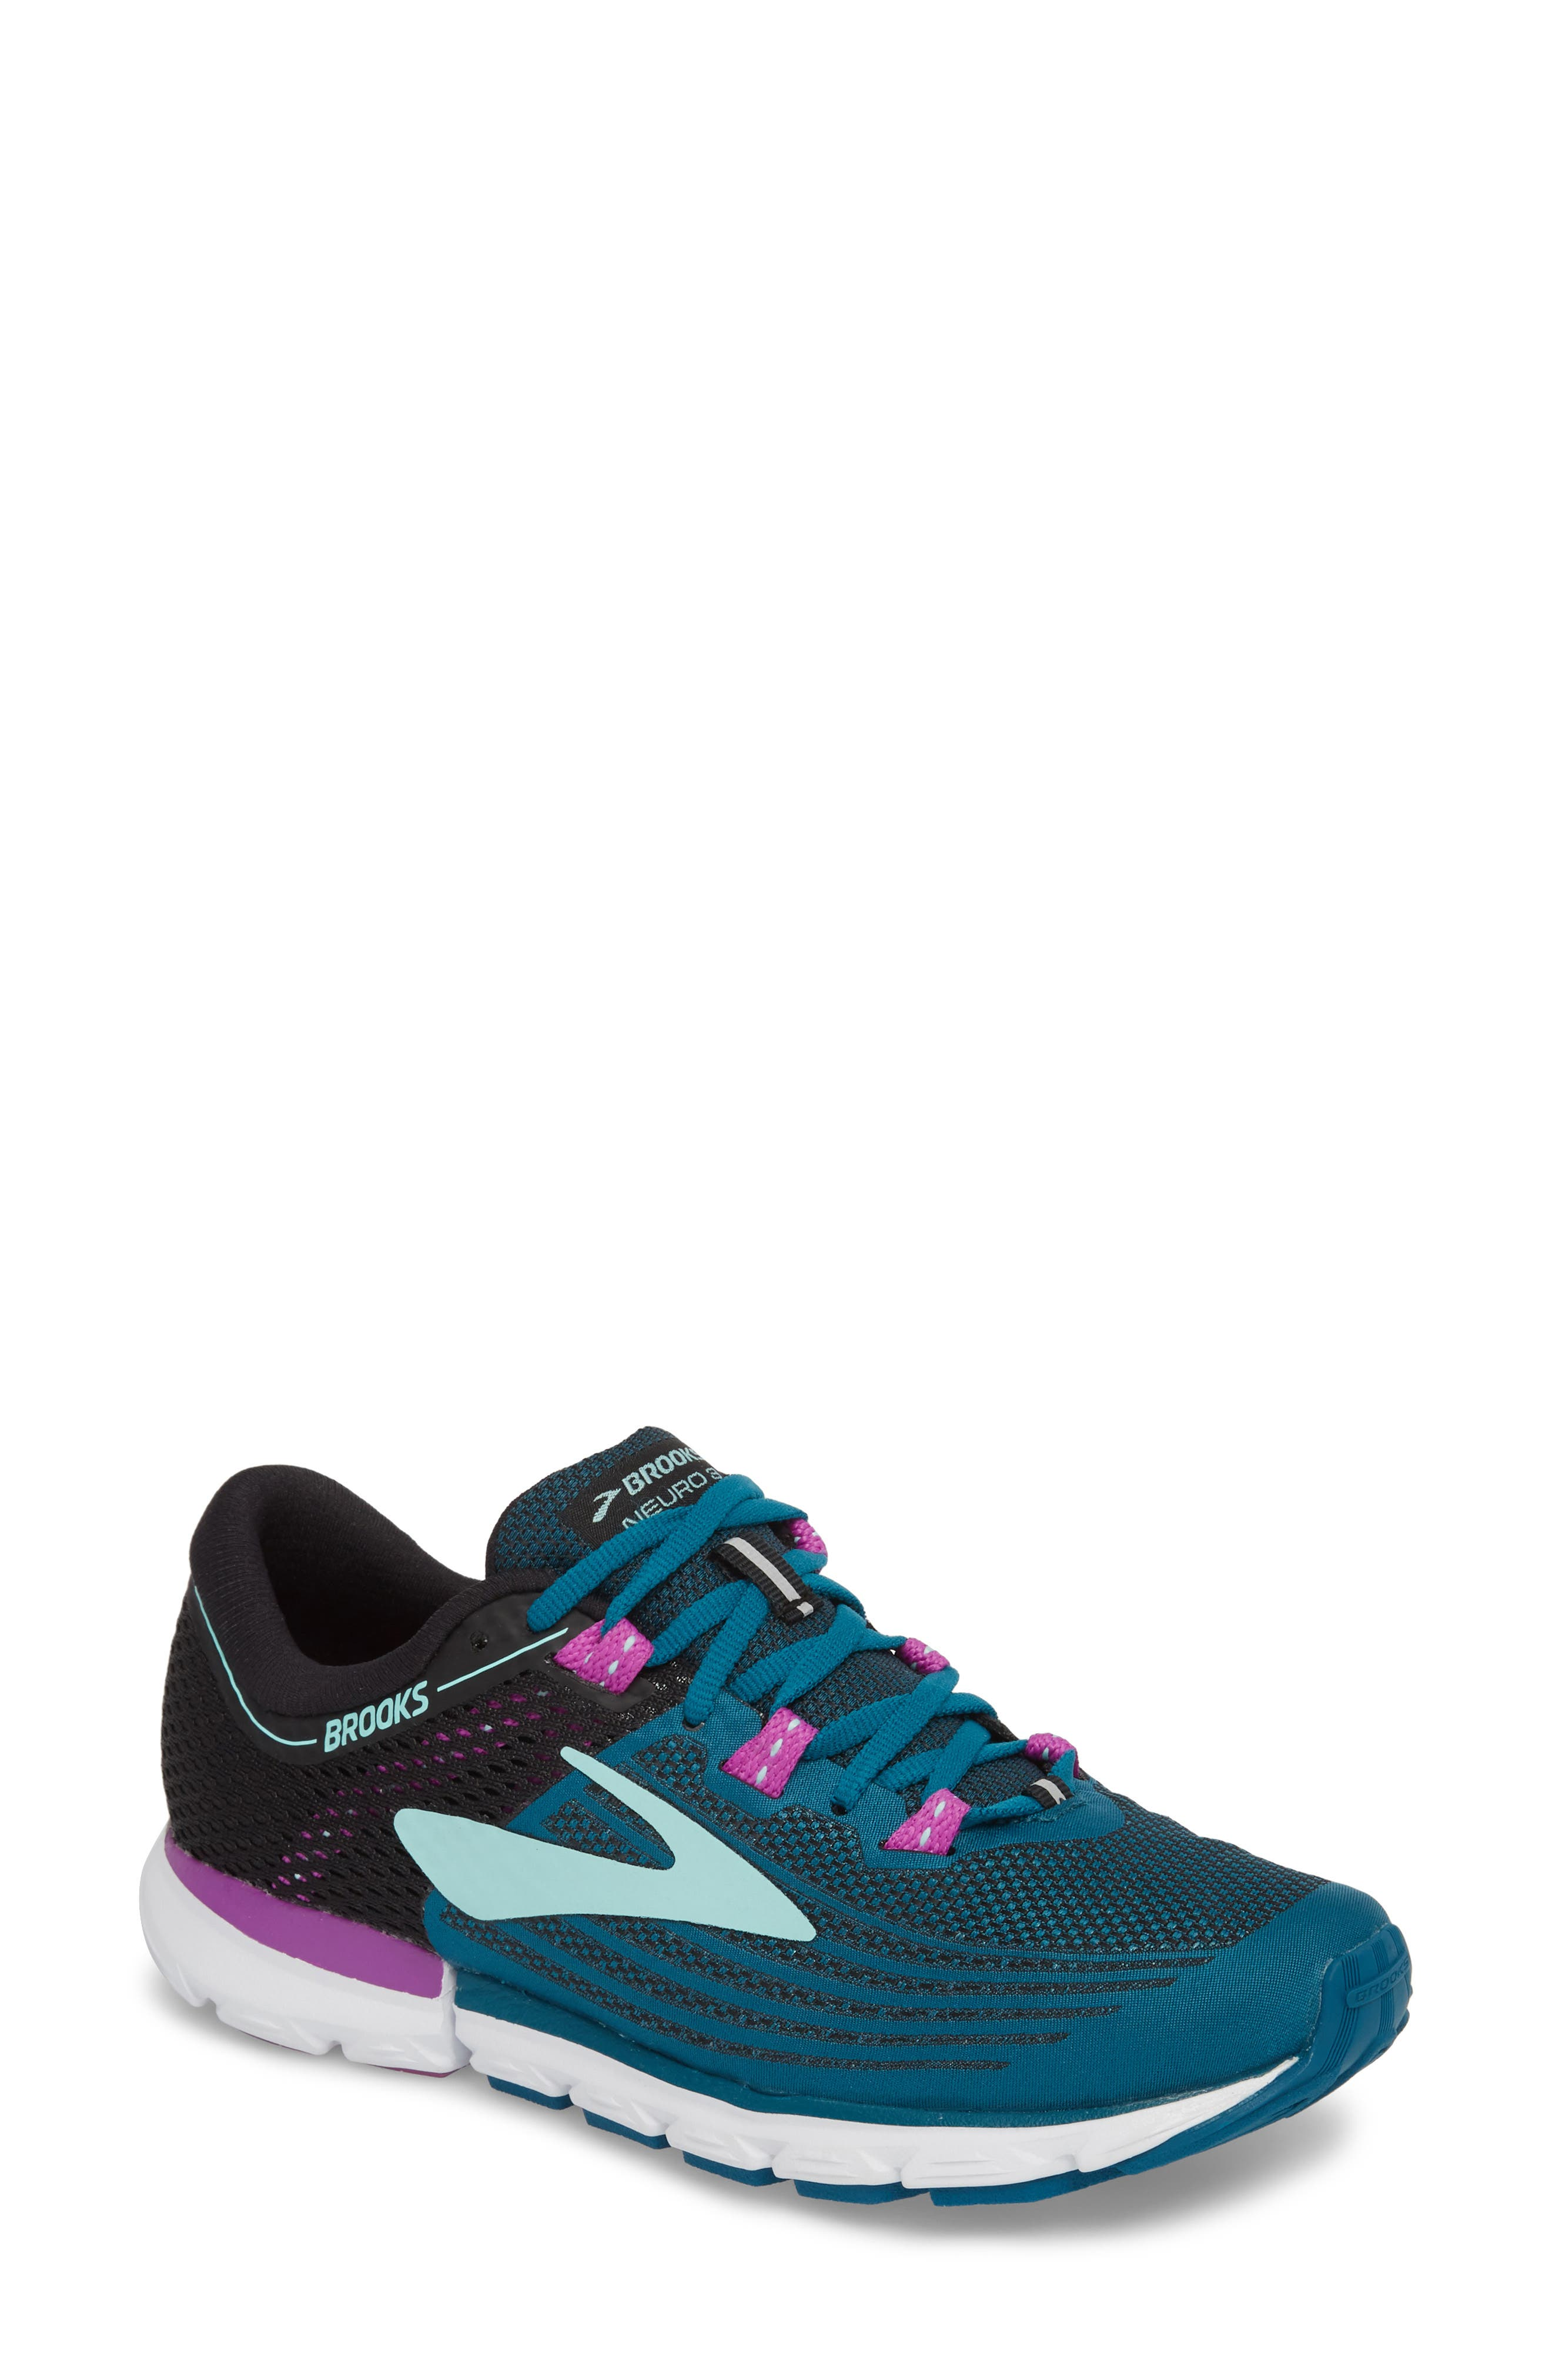 Neuro 3 Running Shoe,                         Main,                         color, Lagoon/ Black/ Purple